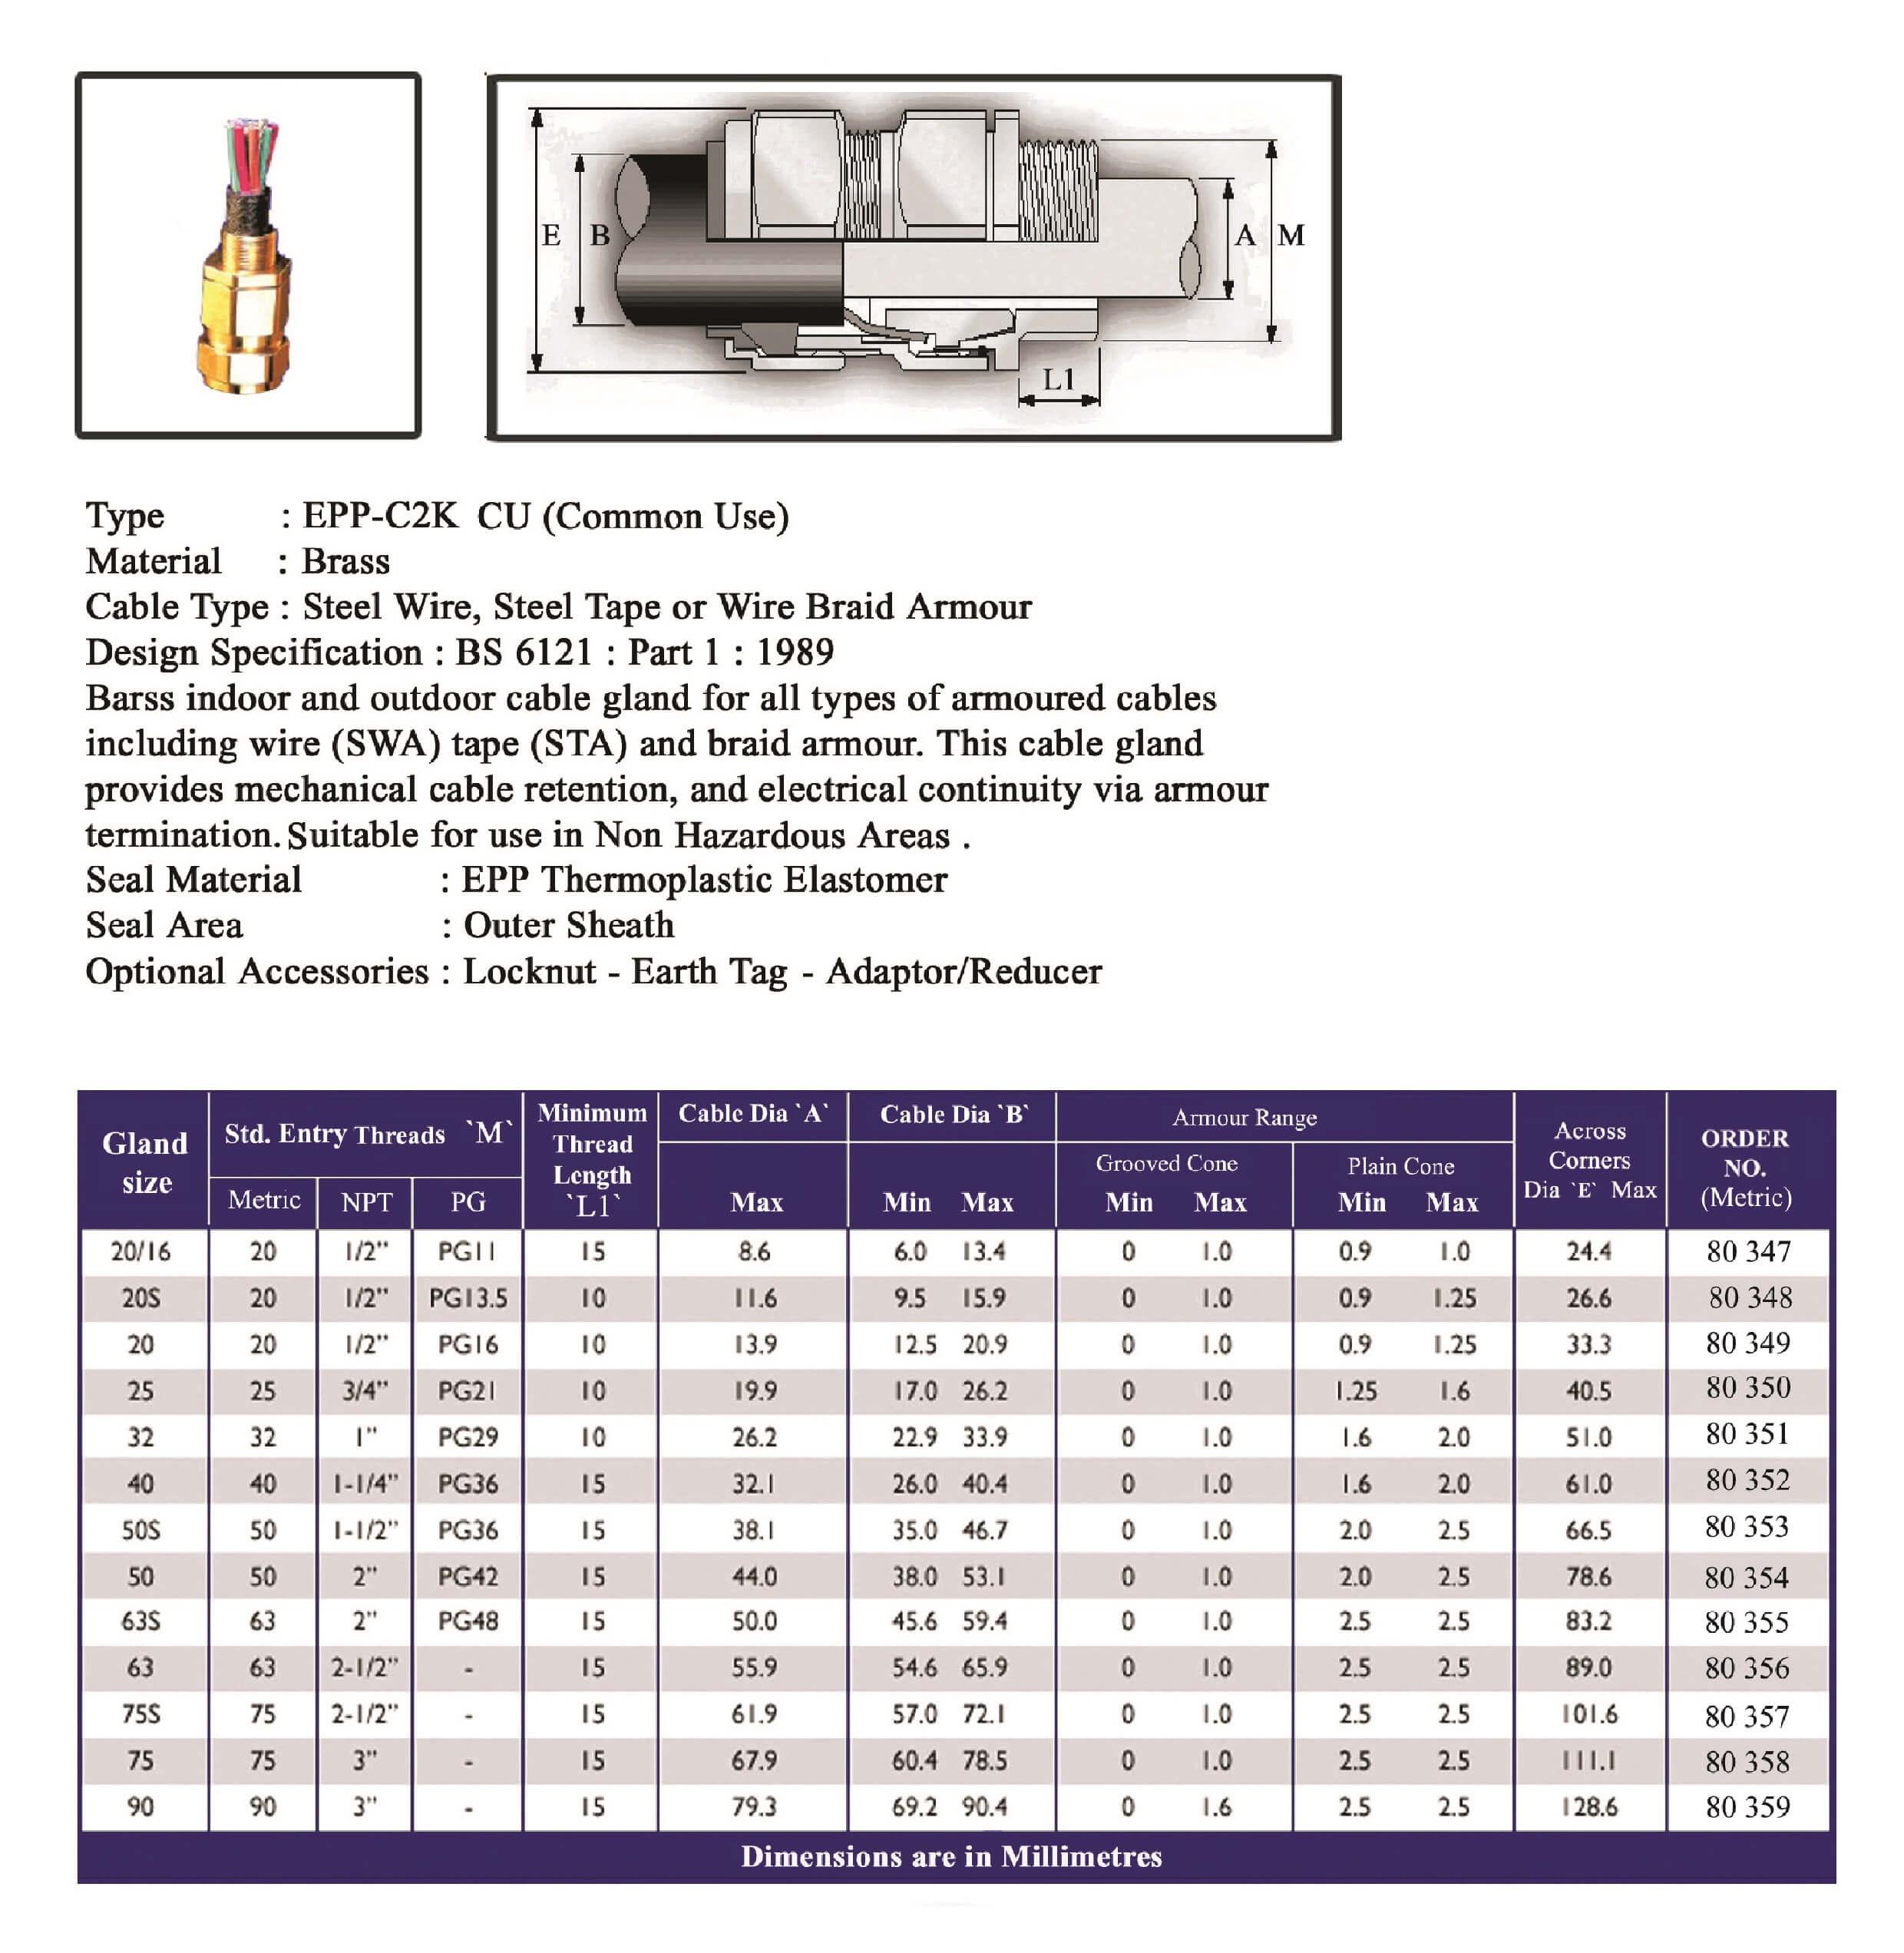 E.P.P - C2K CU (Common Use) Technical Datasheet